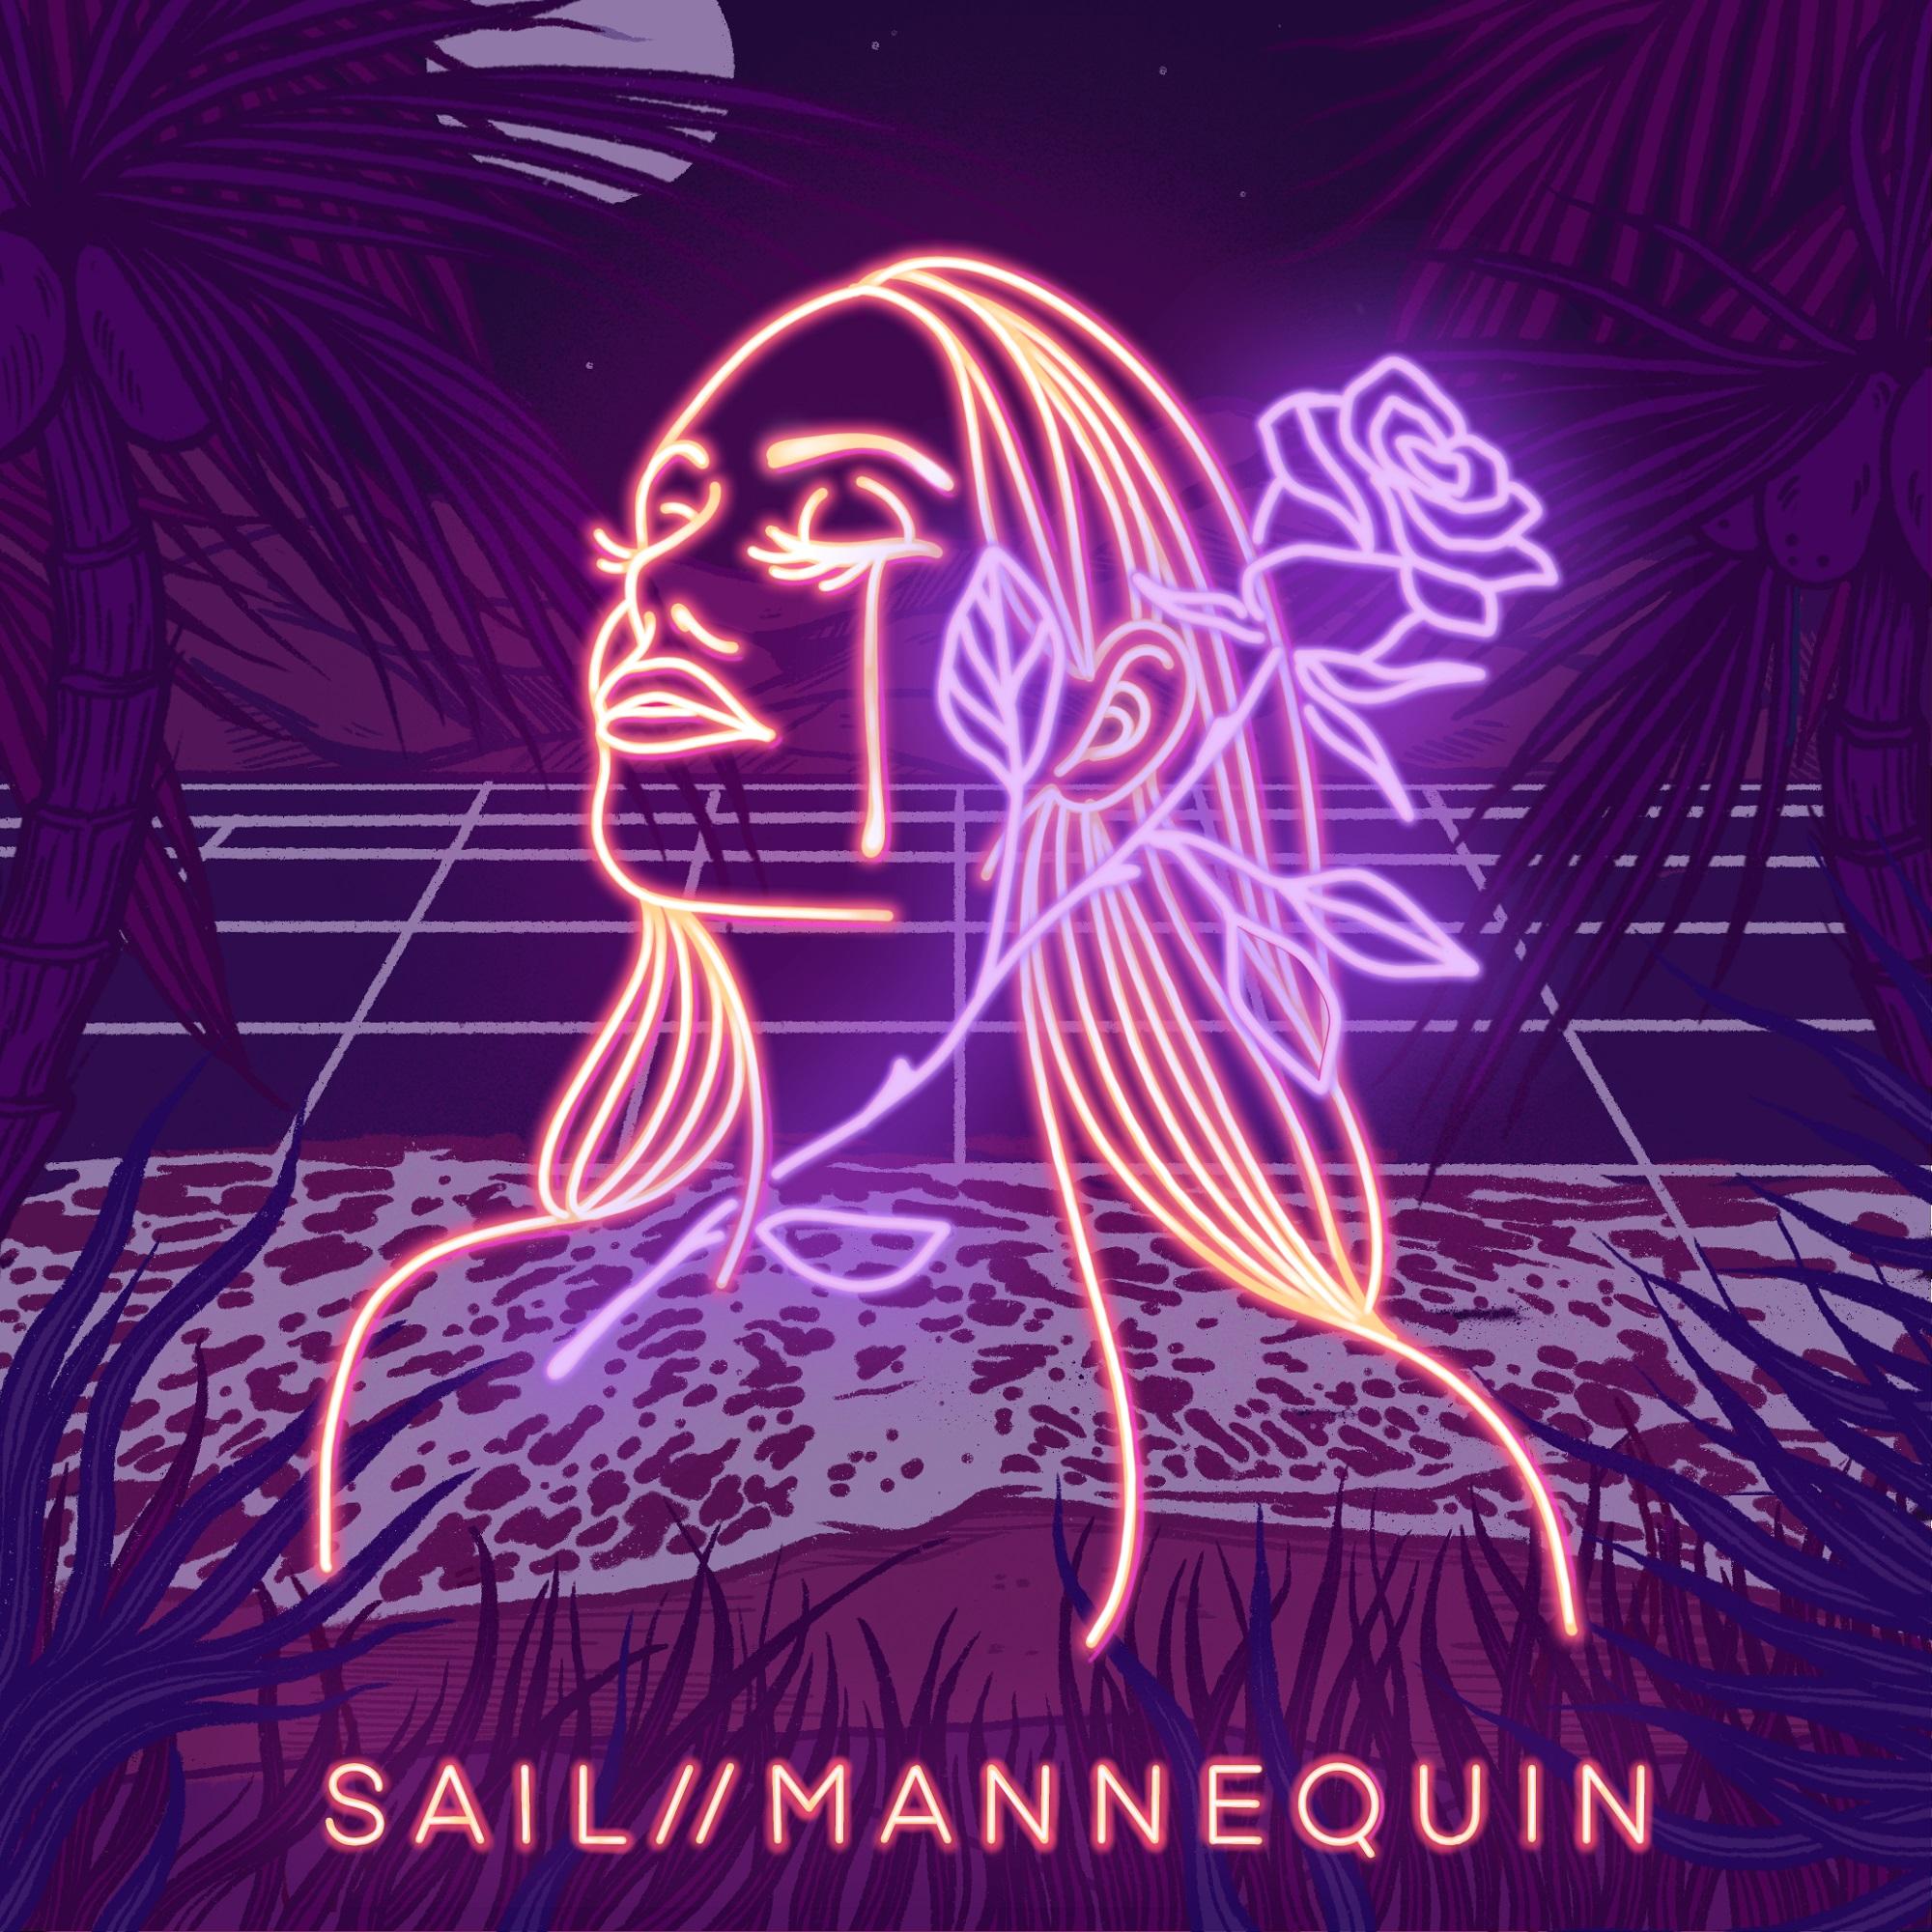 Sail Mannequin